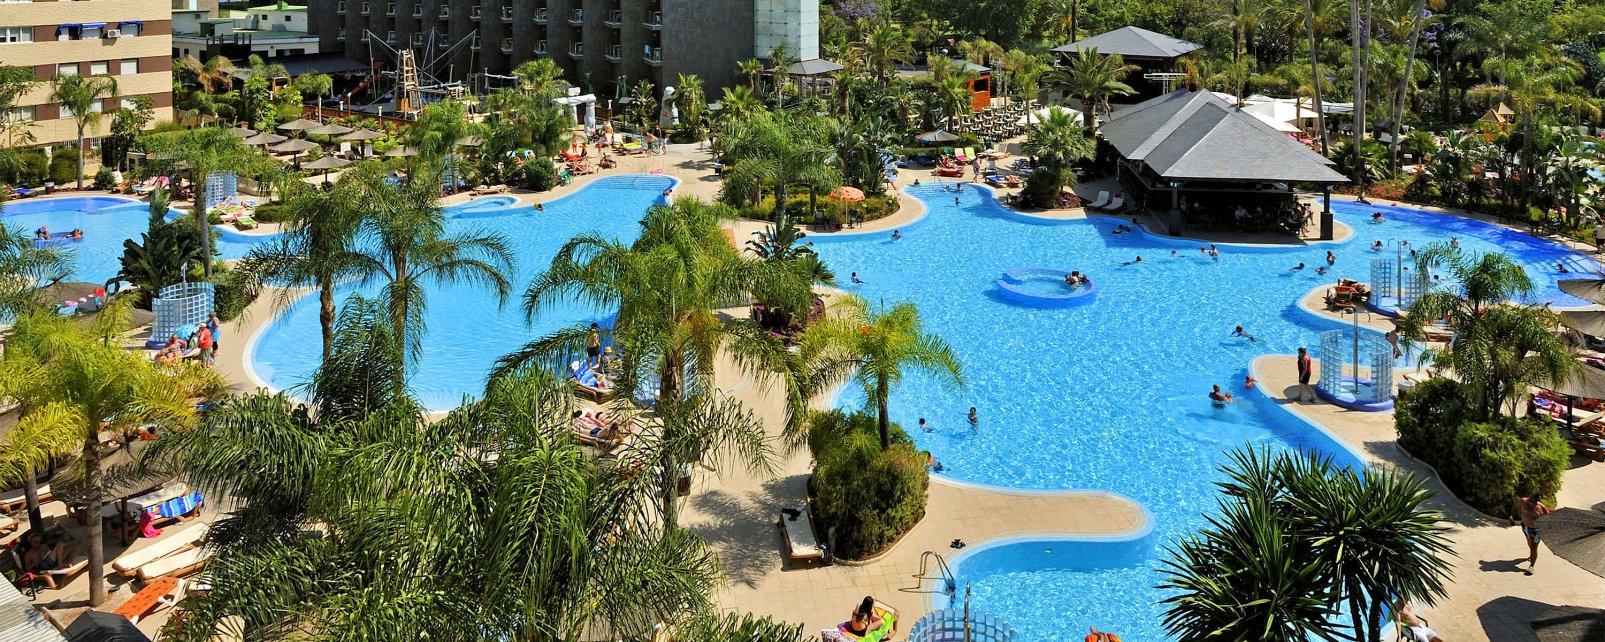 Sol Principe Hotel Malaga Spain